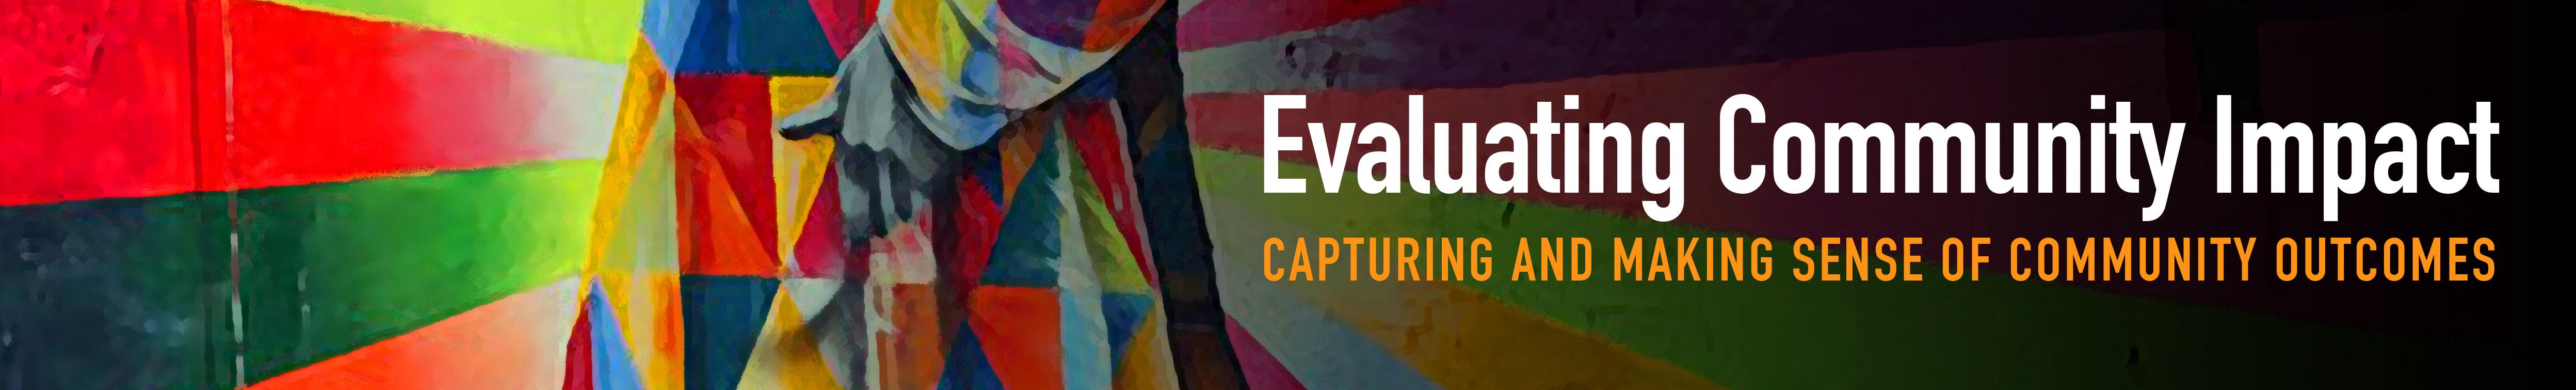 Evaluating Community Impact banner